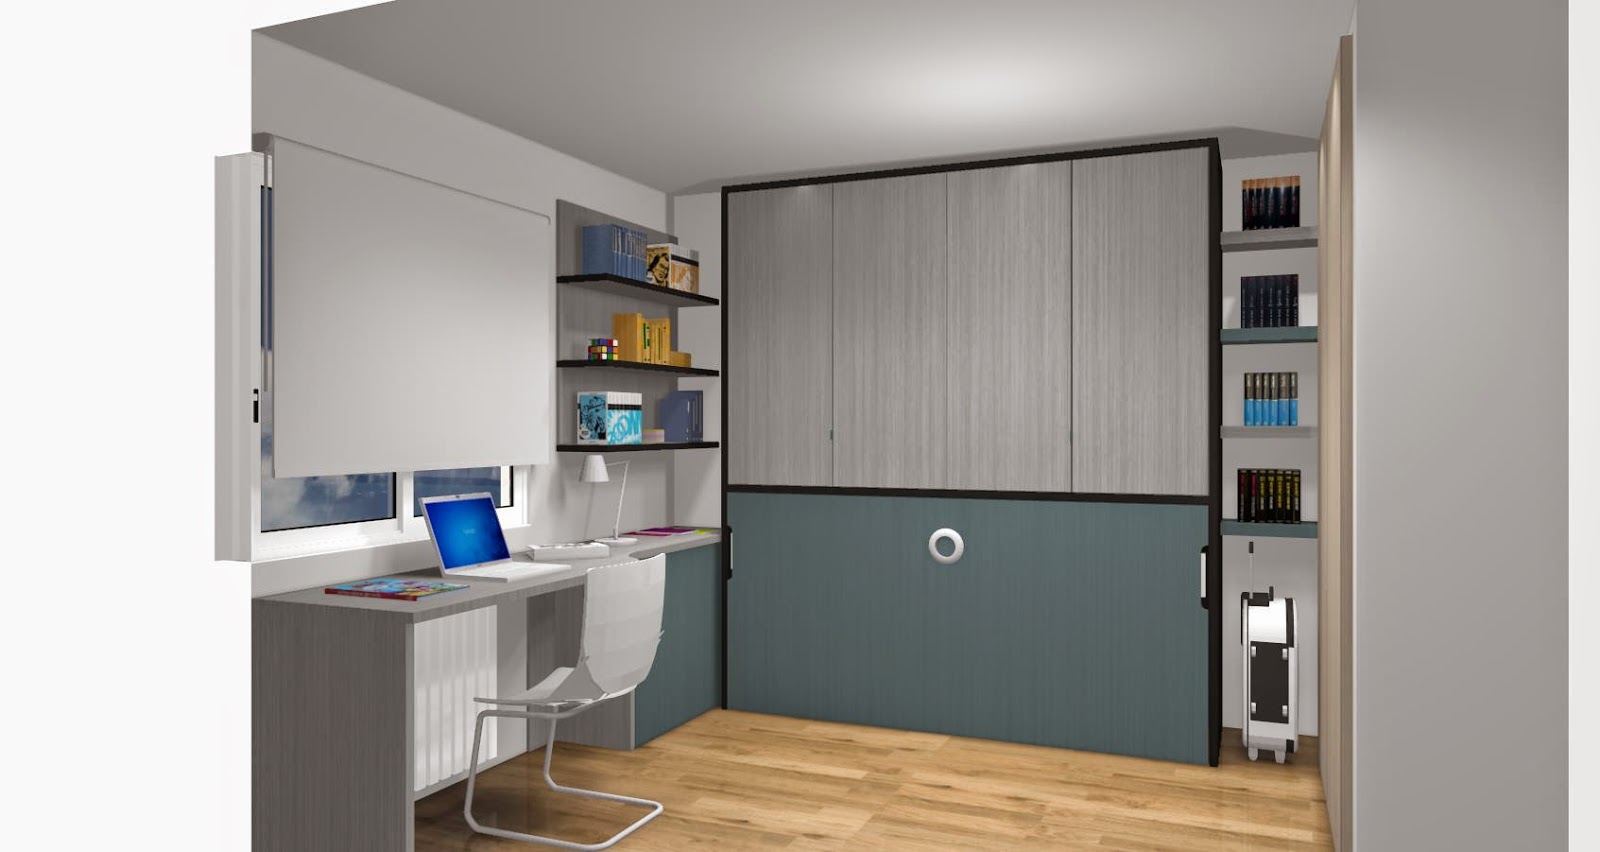 Dise o de cuartos o dormitorios juveniles for Habitaciones juveniles abatibles